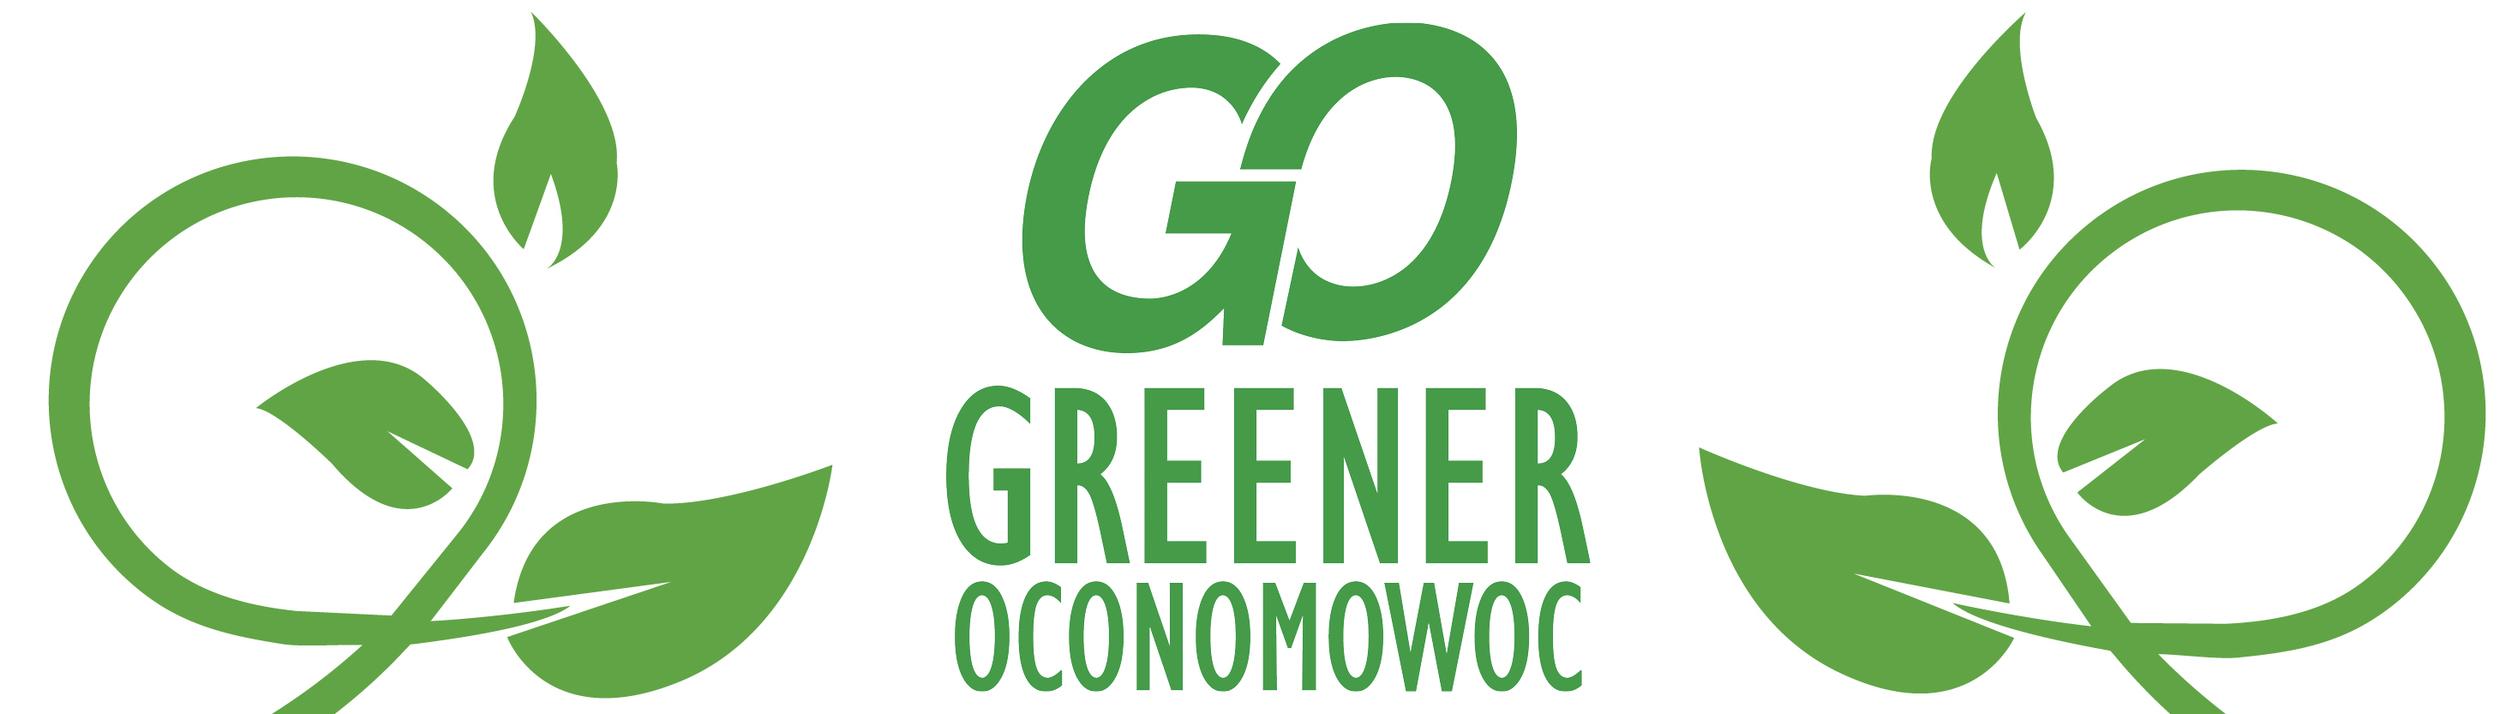 Greener Oconomowoc.jpg